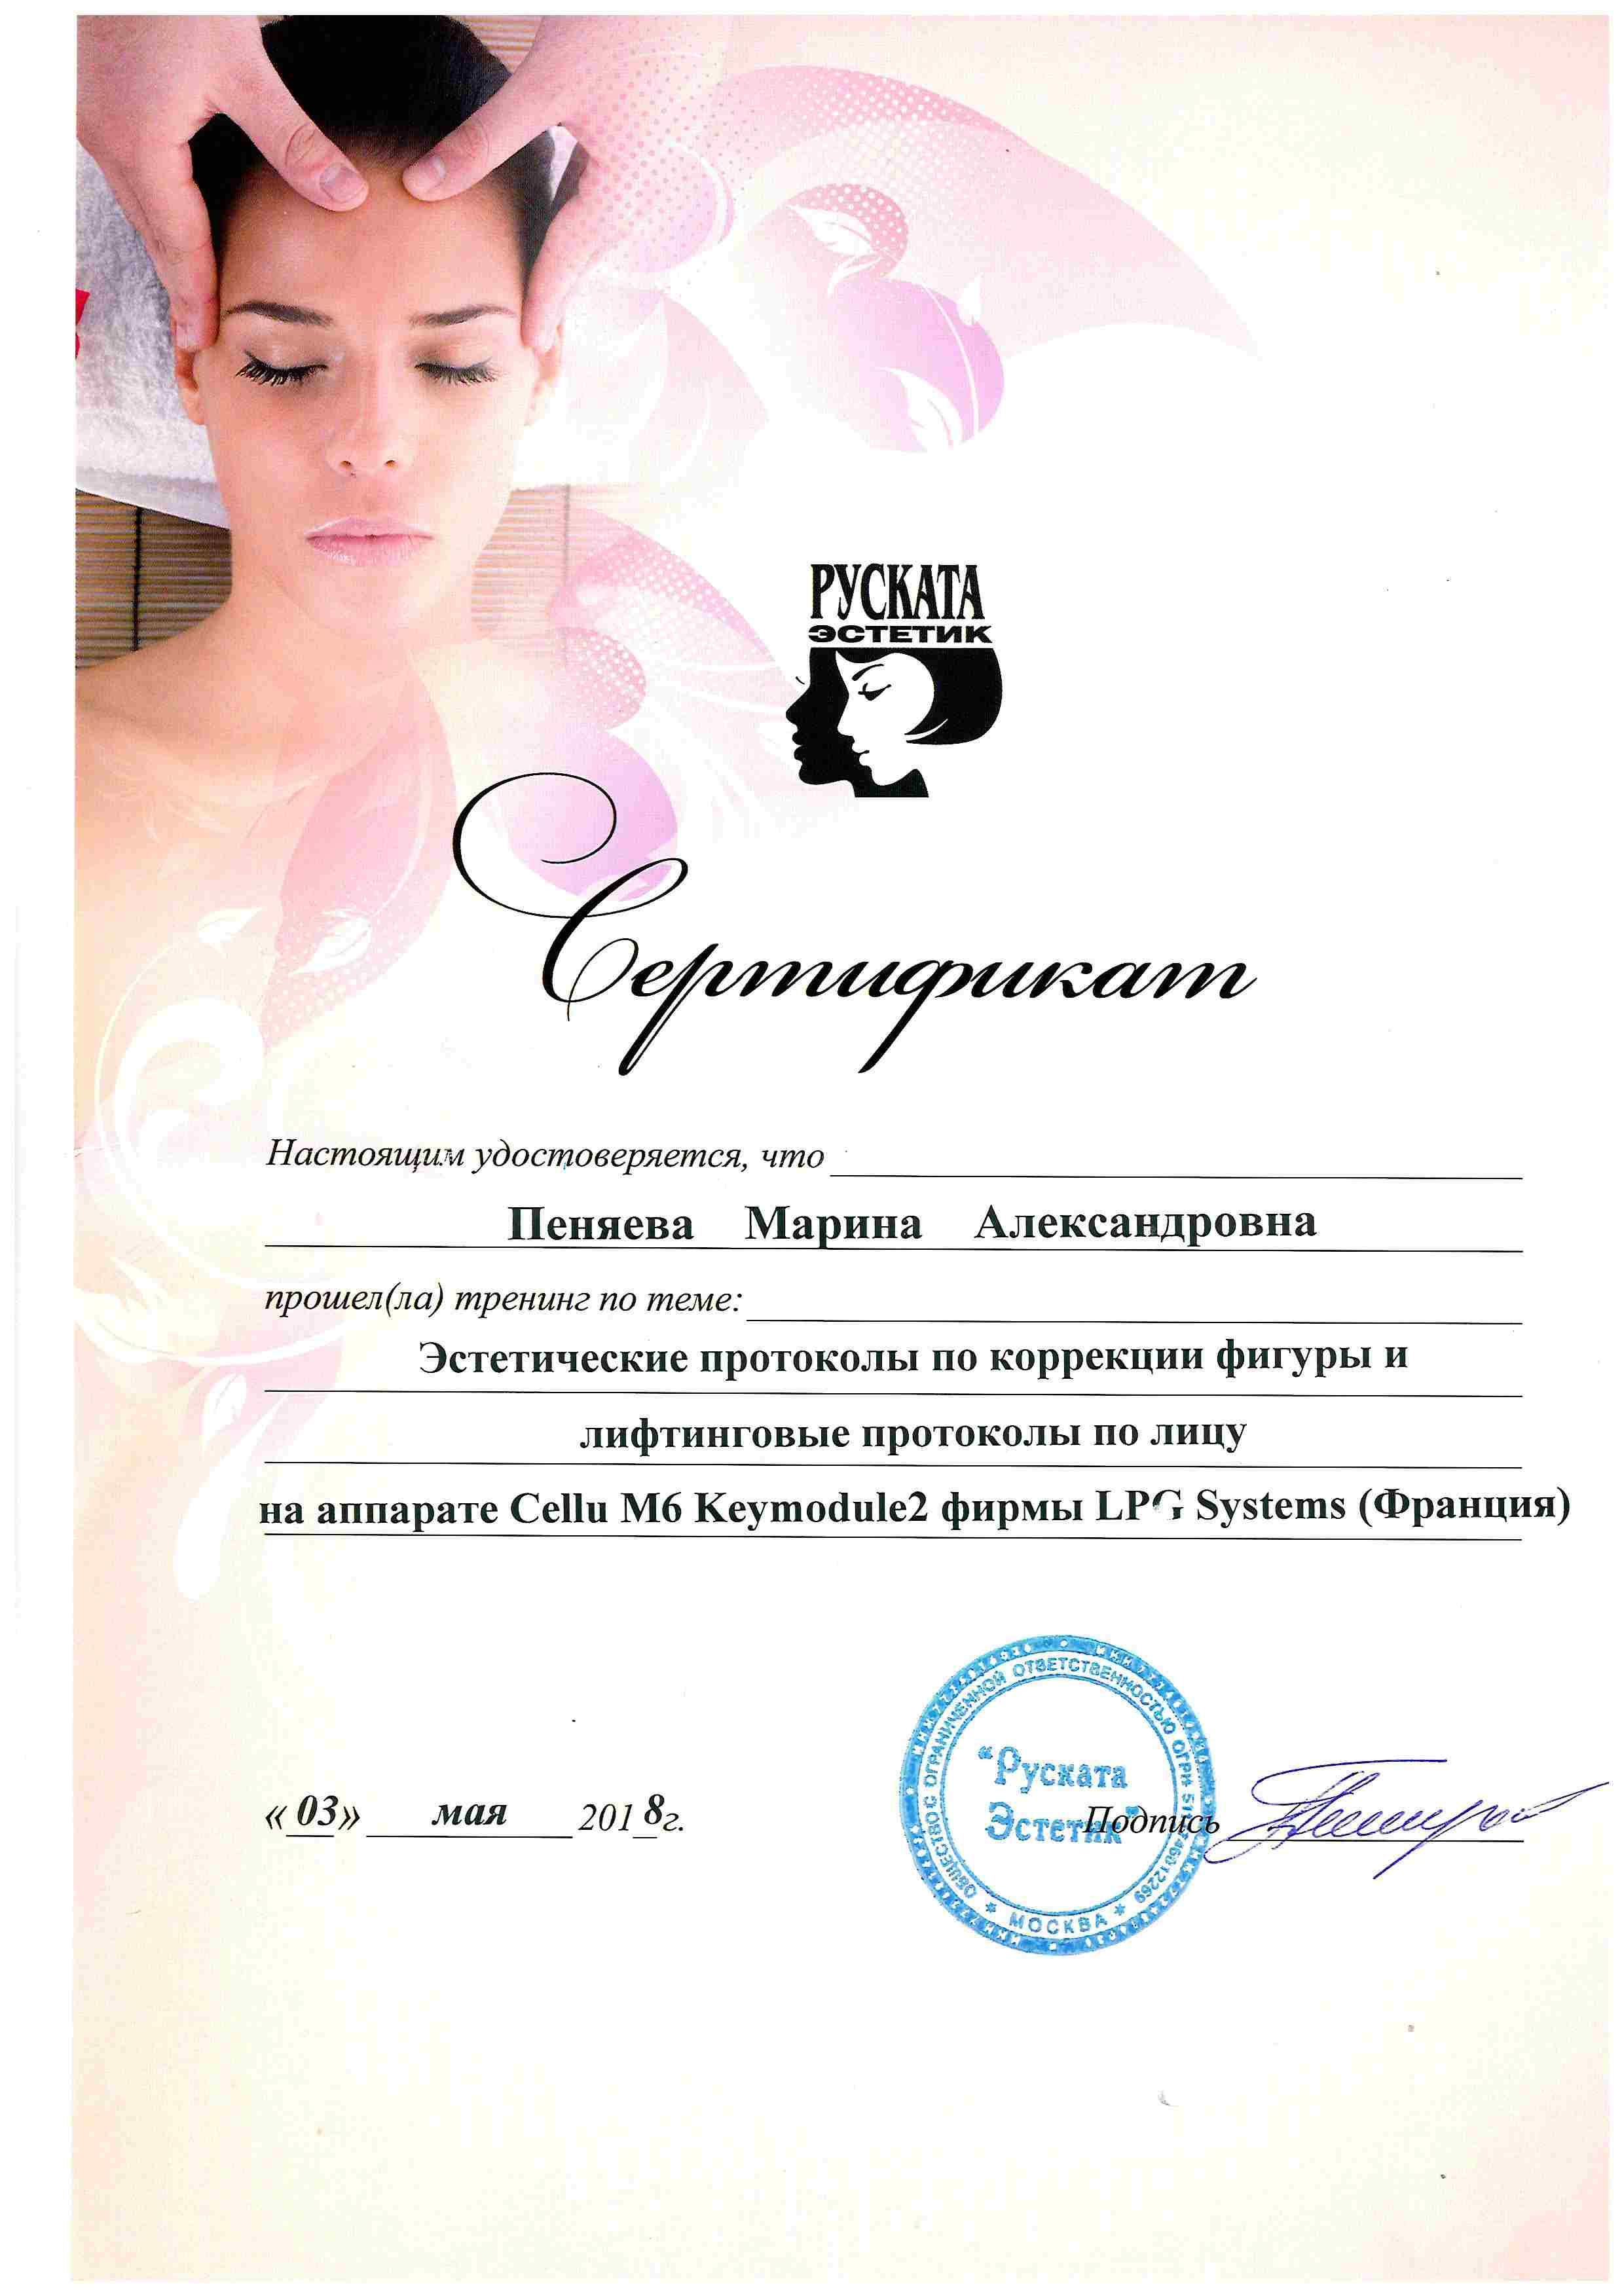 Сертификат — Тренинг «Эстетические протоколы на аппарате Cellu M6 Keymodule2 фирмы LPG System. Пеняева Марина Александровна